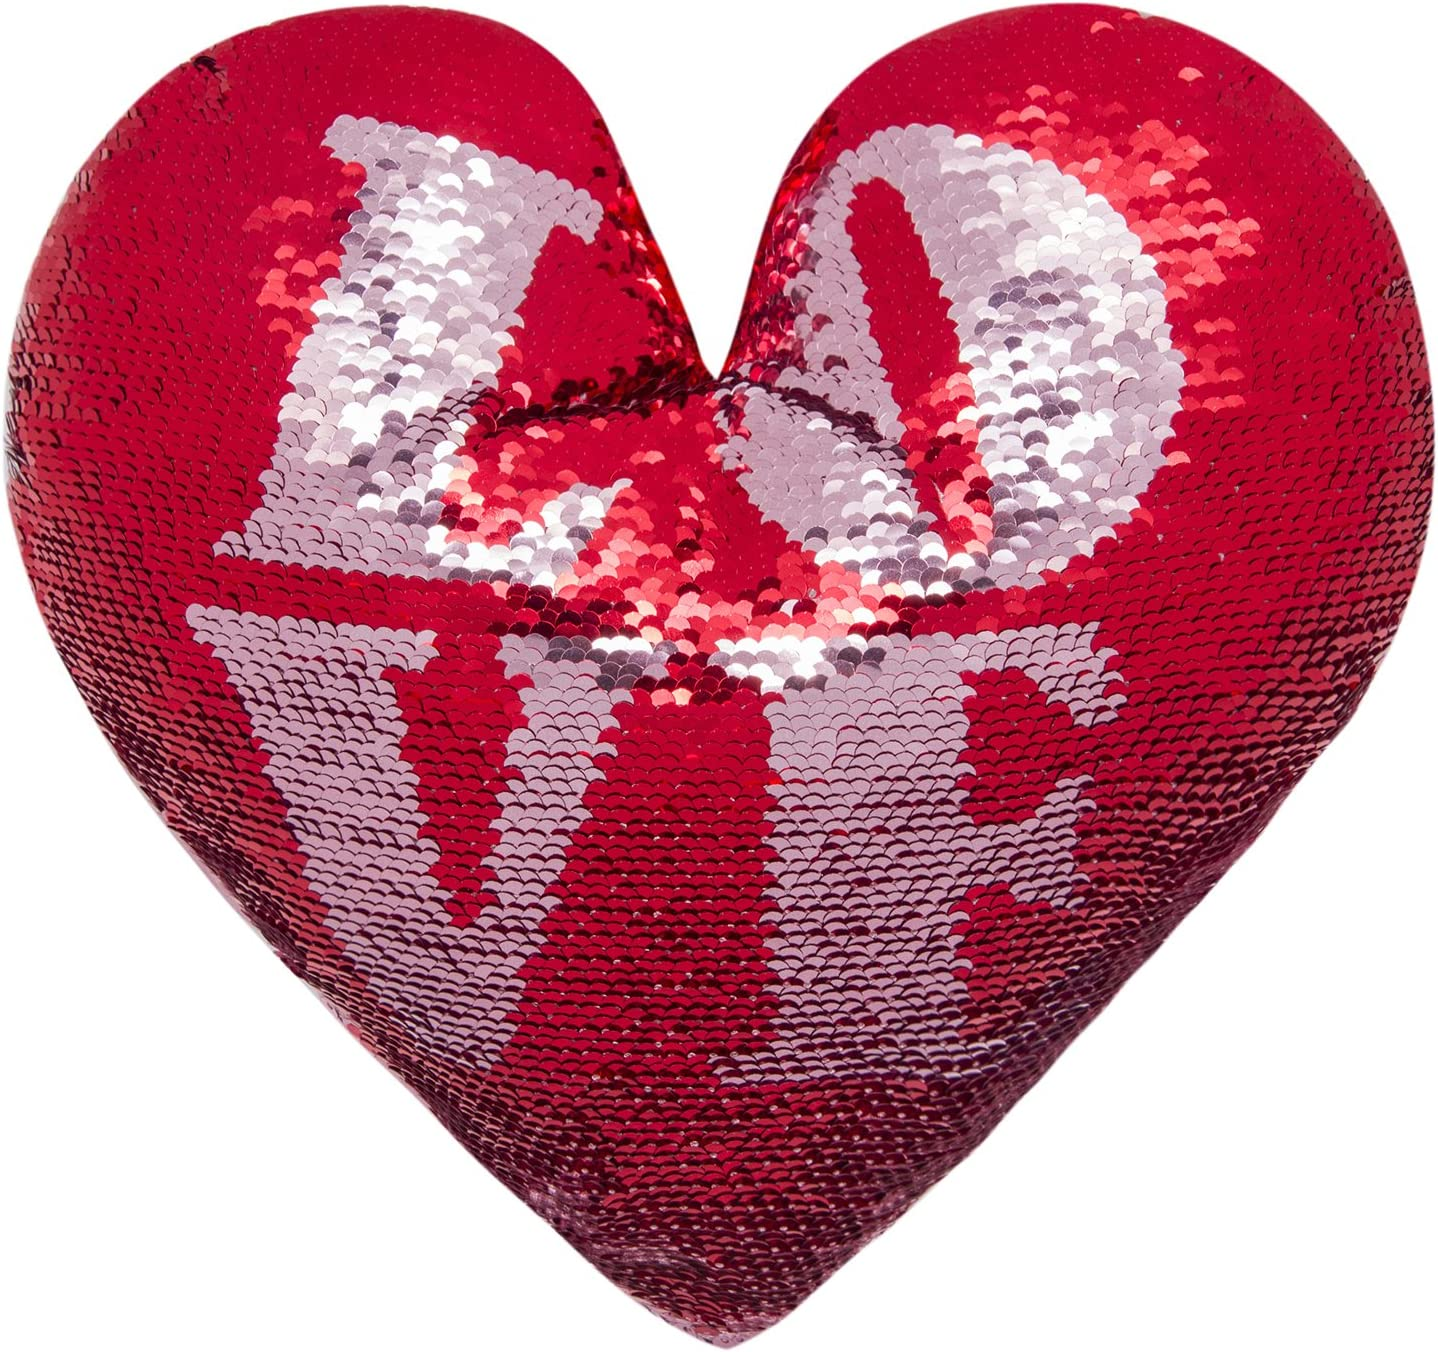 2 colori a forma di cuore Reversible Decorative Paillettes Cushion Pillow Ataya Mermaid Throw Pillow con inserto